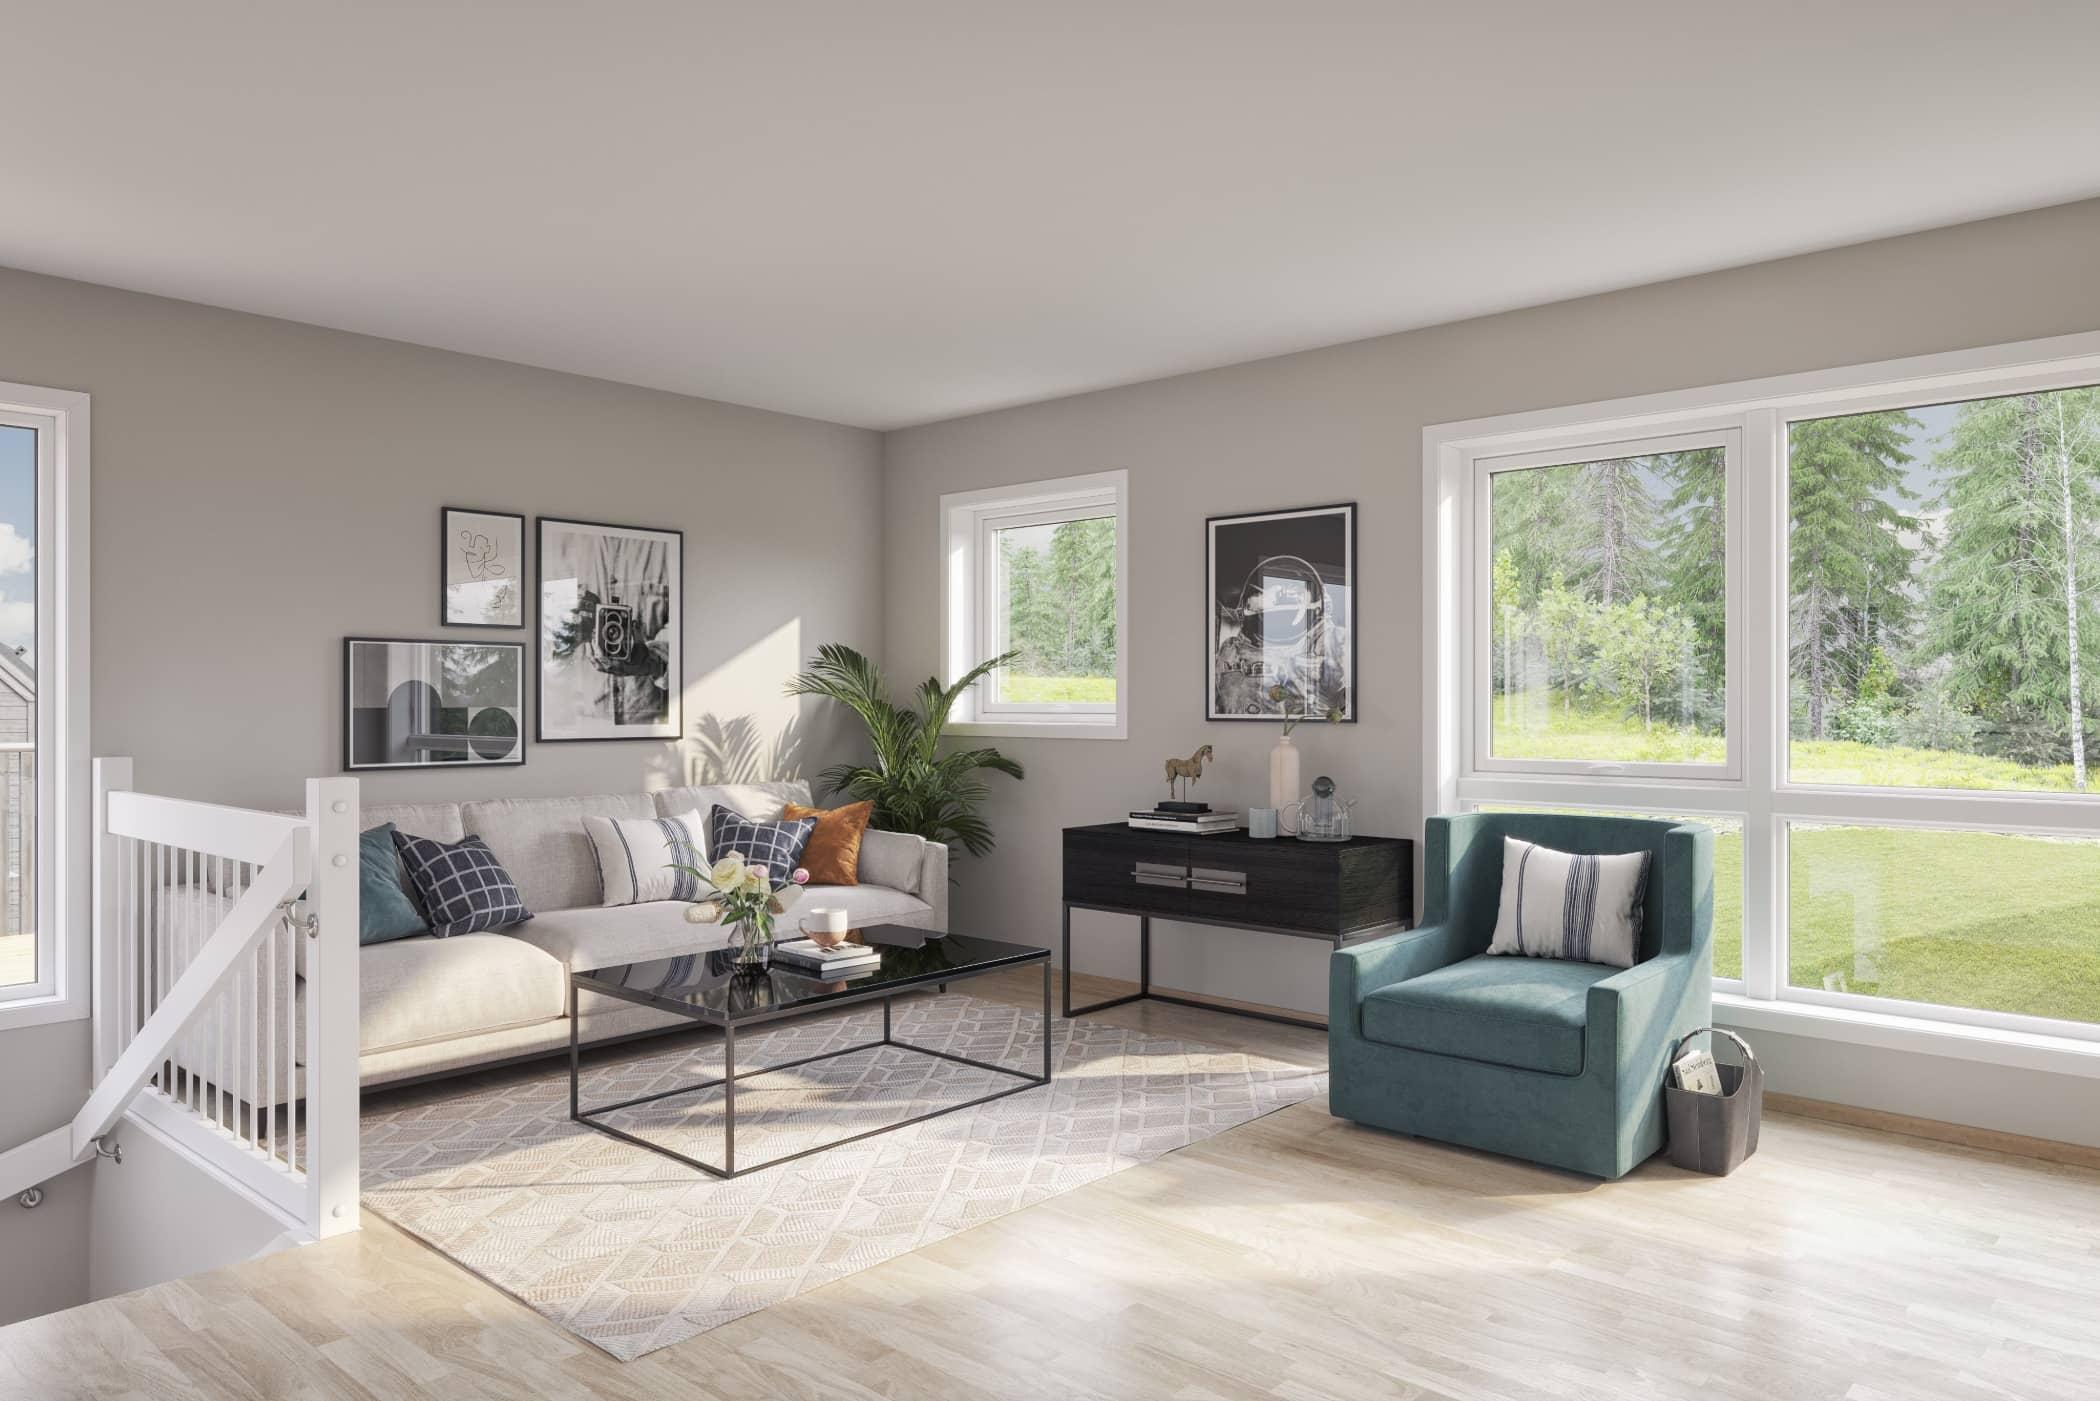 Laminate flooring, Interior design, Living room, House, Home, Floor, Building, Property, Furniture